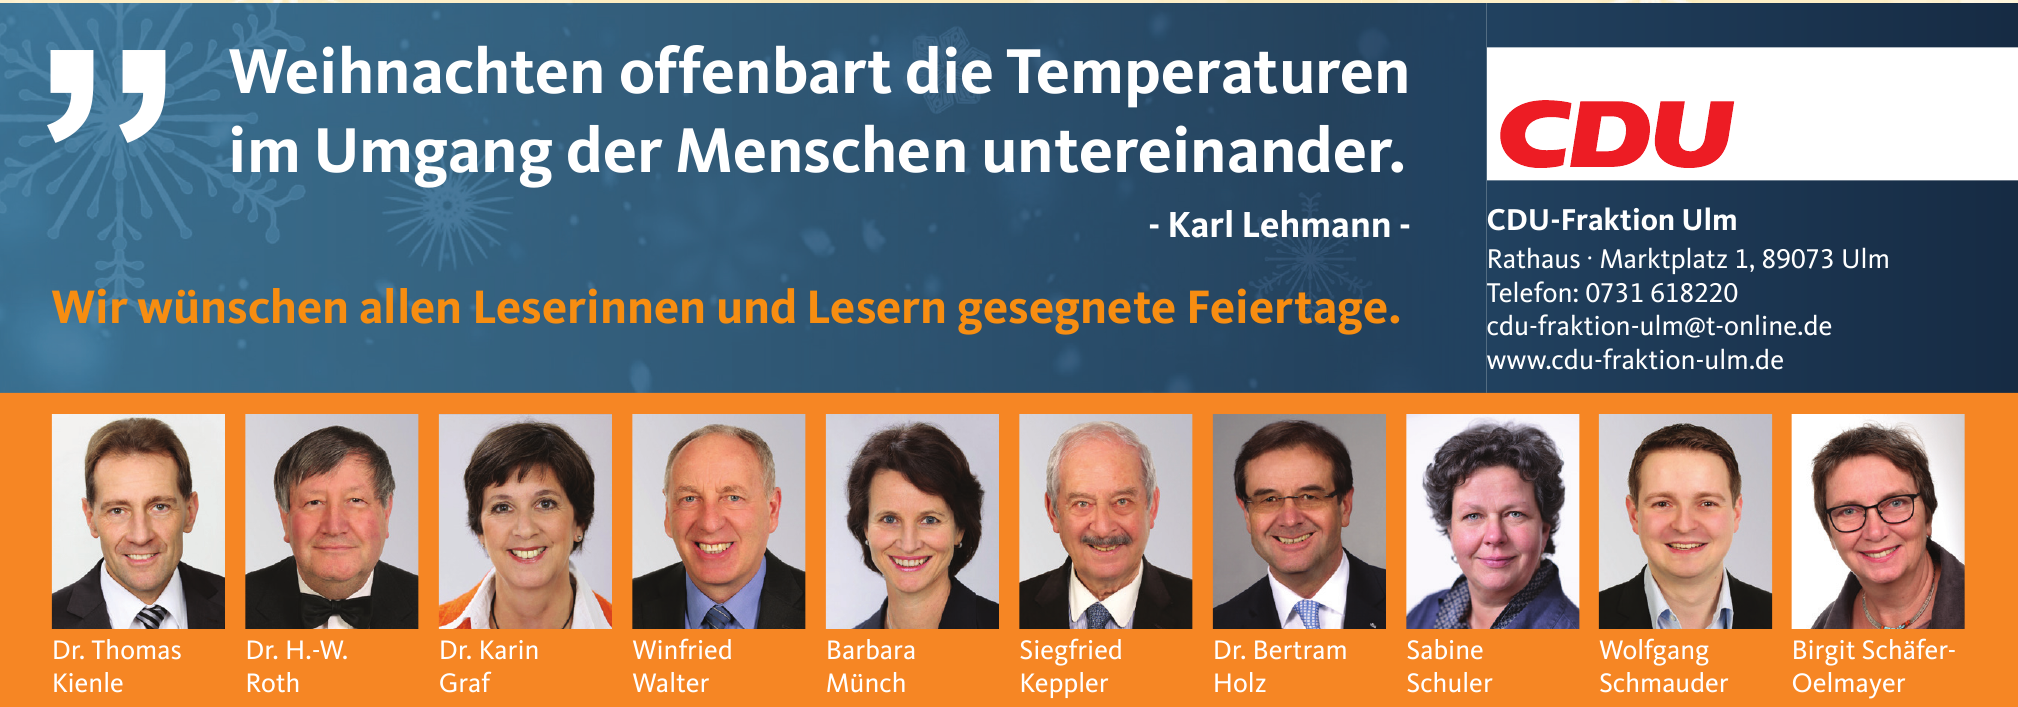 CDU-Fraktion Ulm